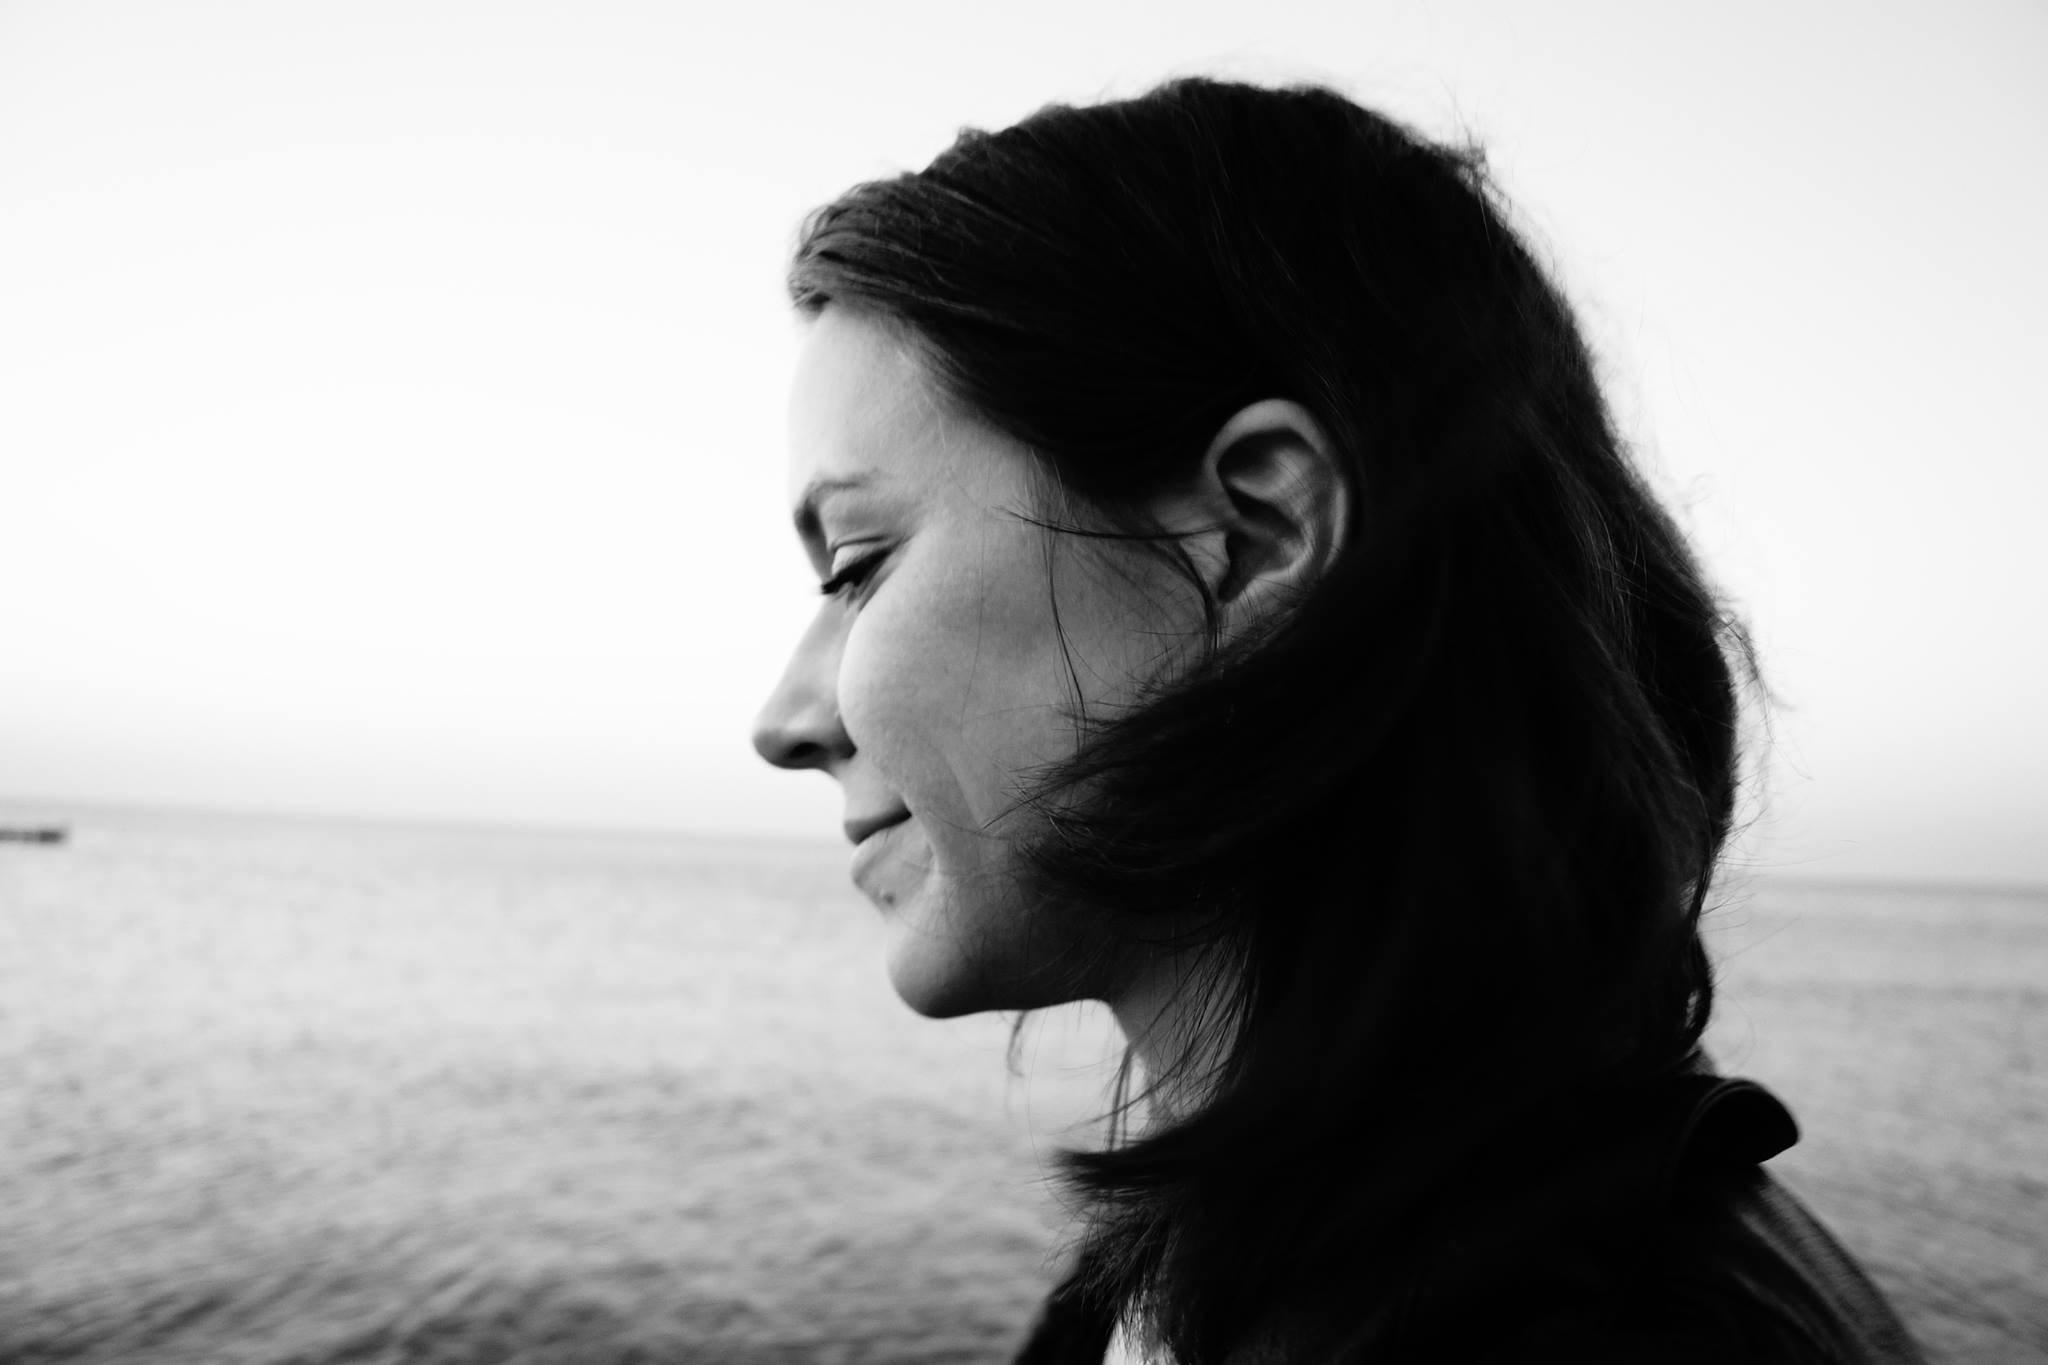 Go to Anja Brauer's profile